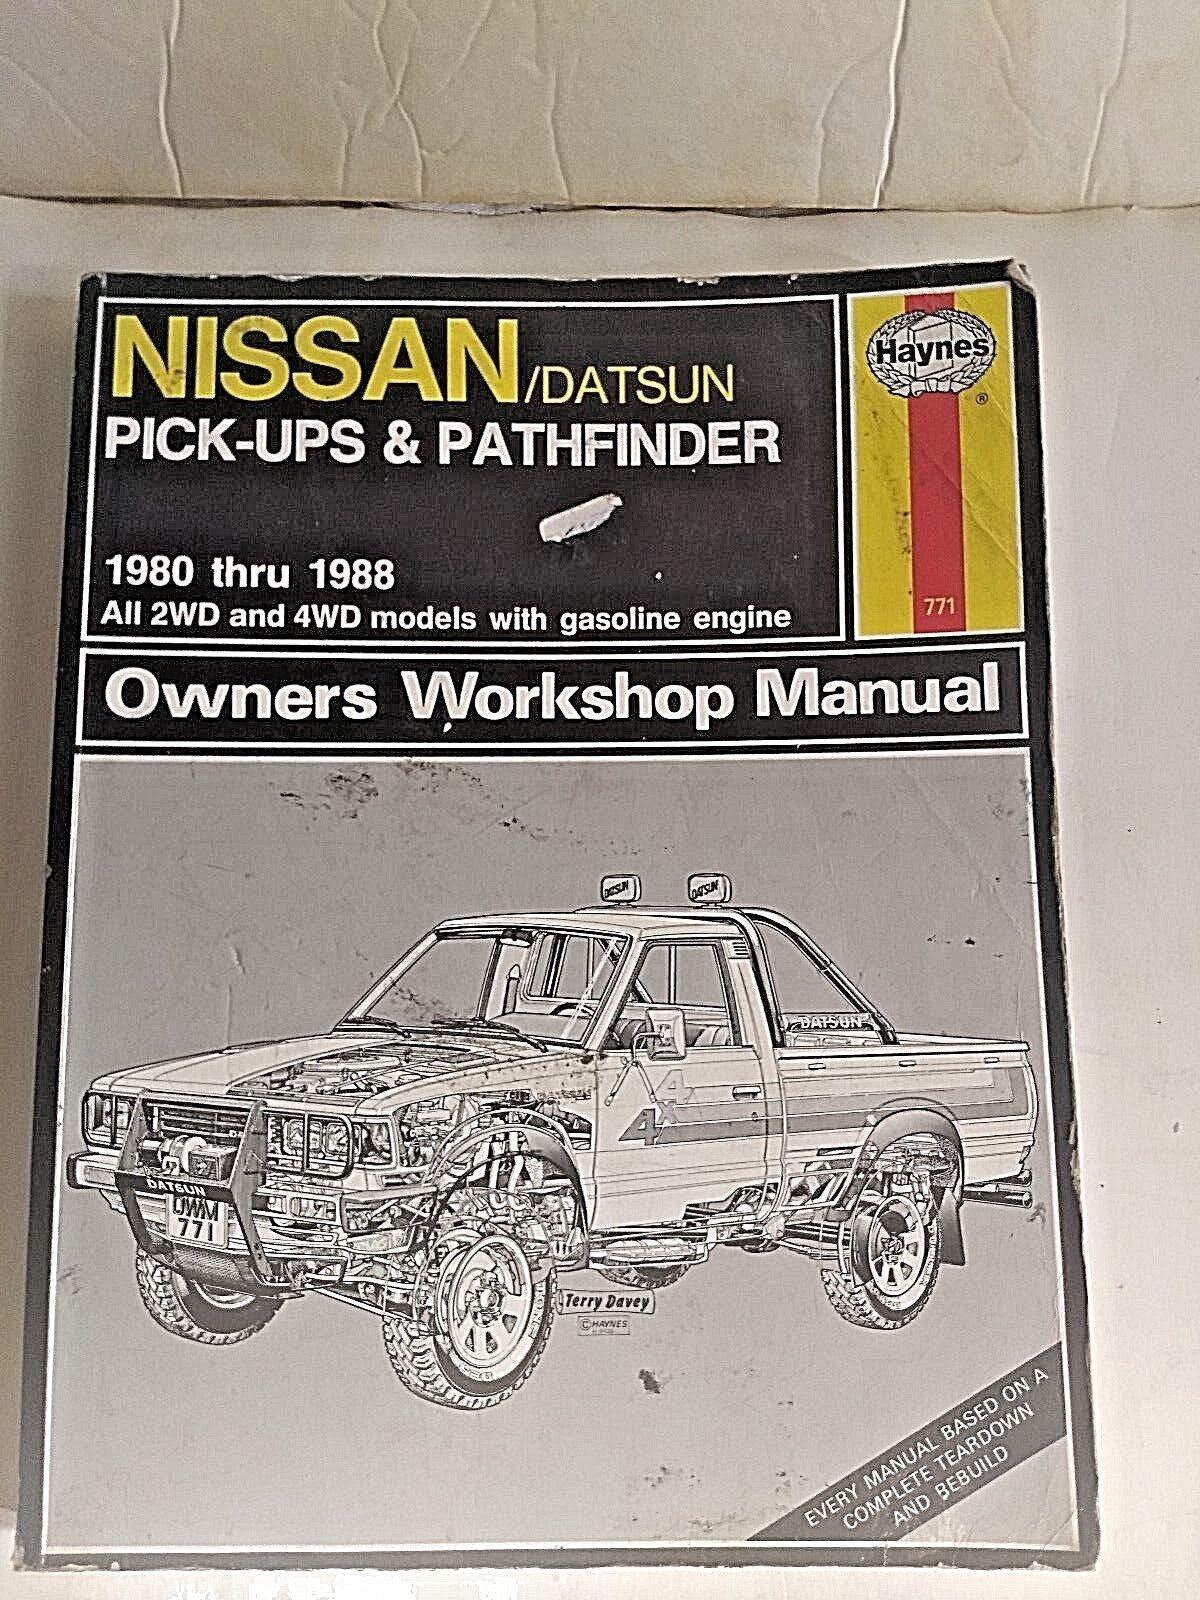 Haynes Nissan/Datsun Pick-Ups & Pathfinder 1980 thru 1988 #771